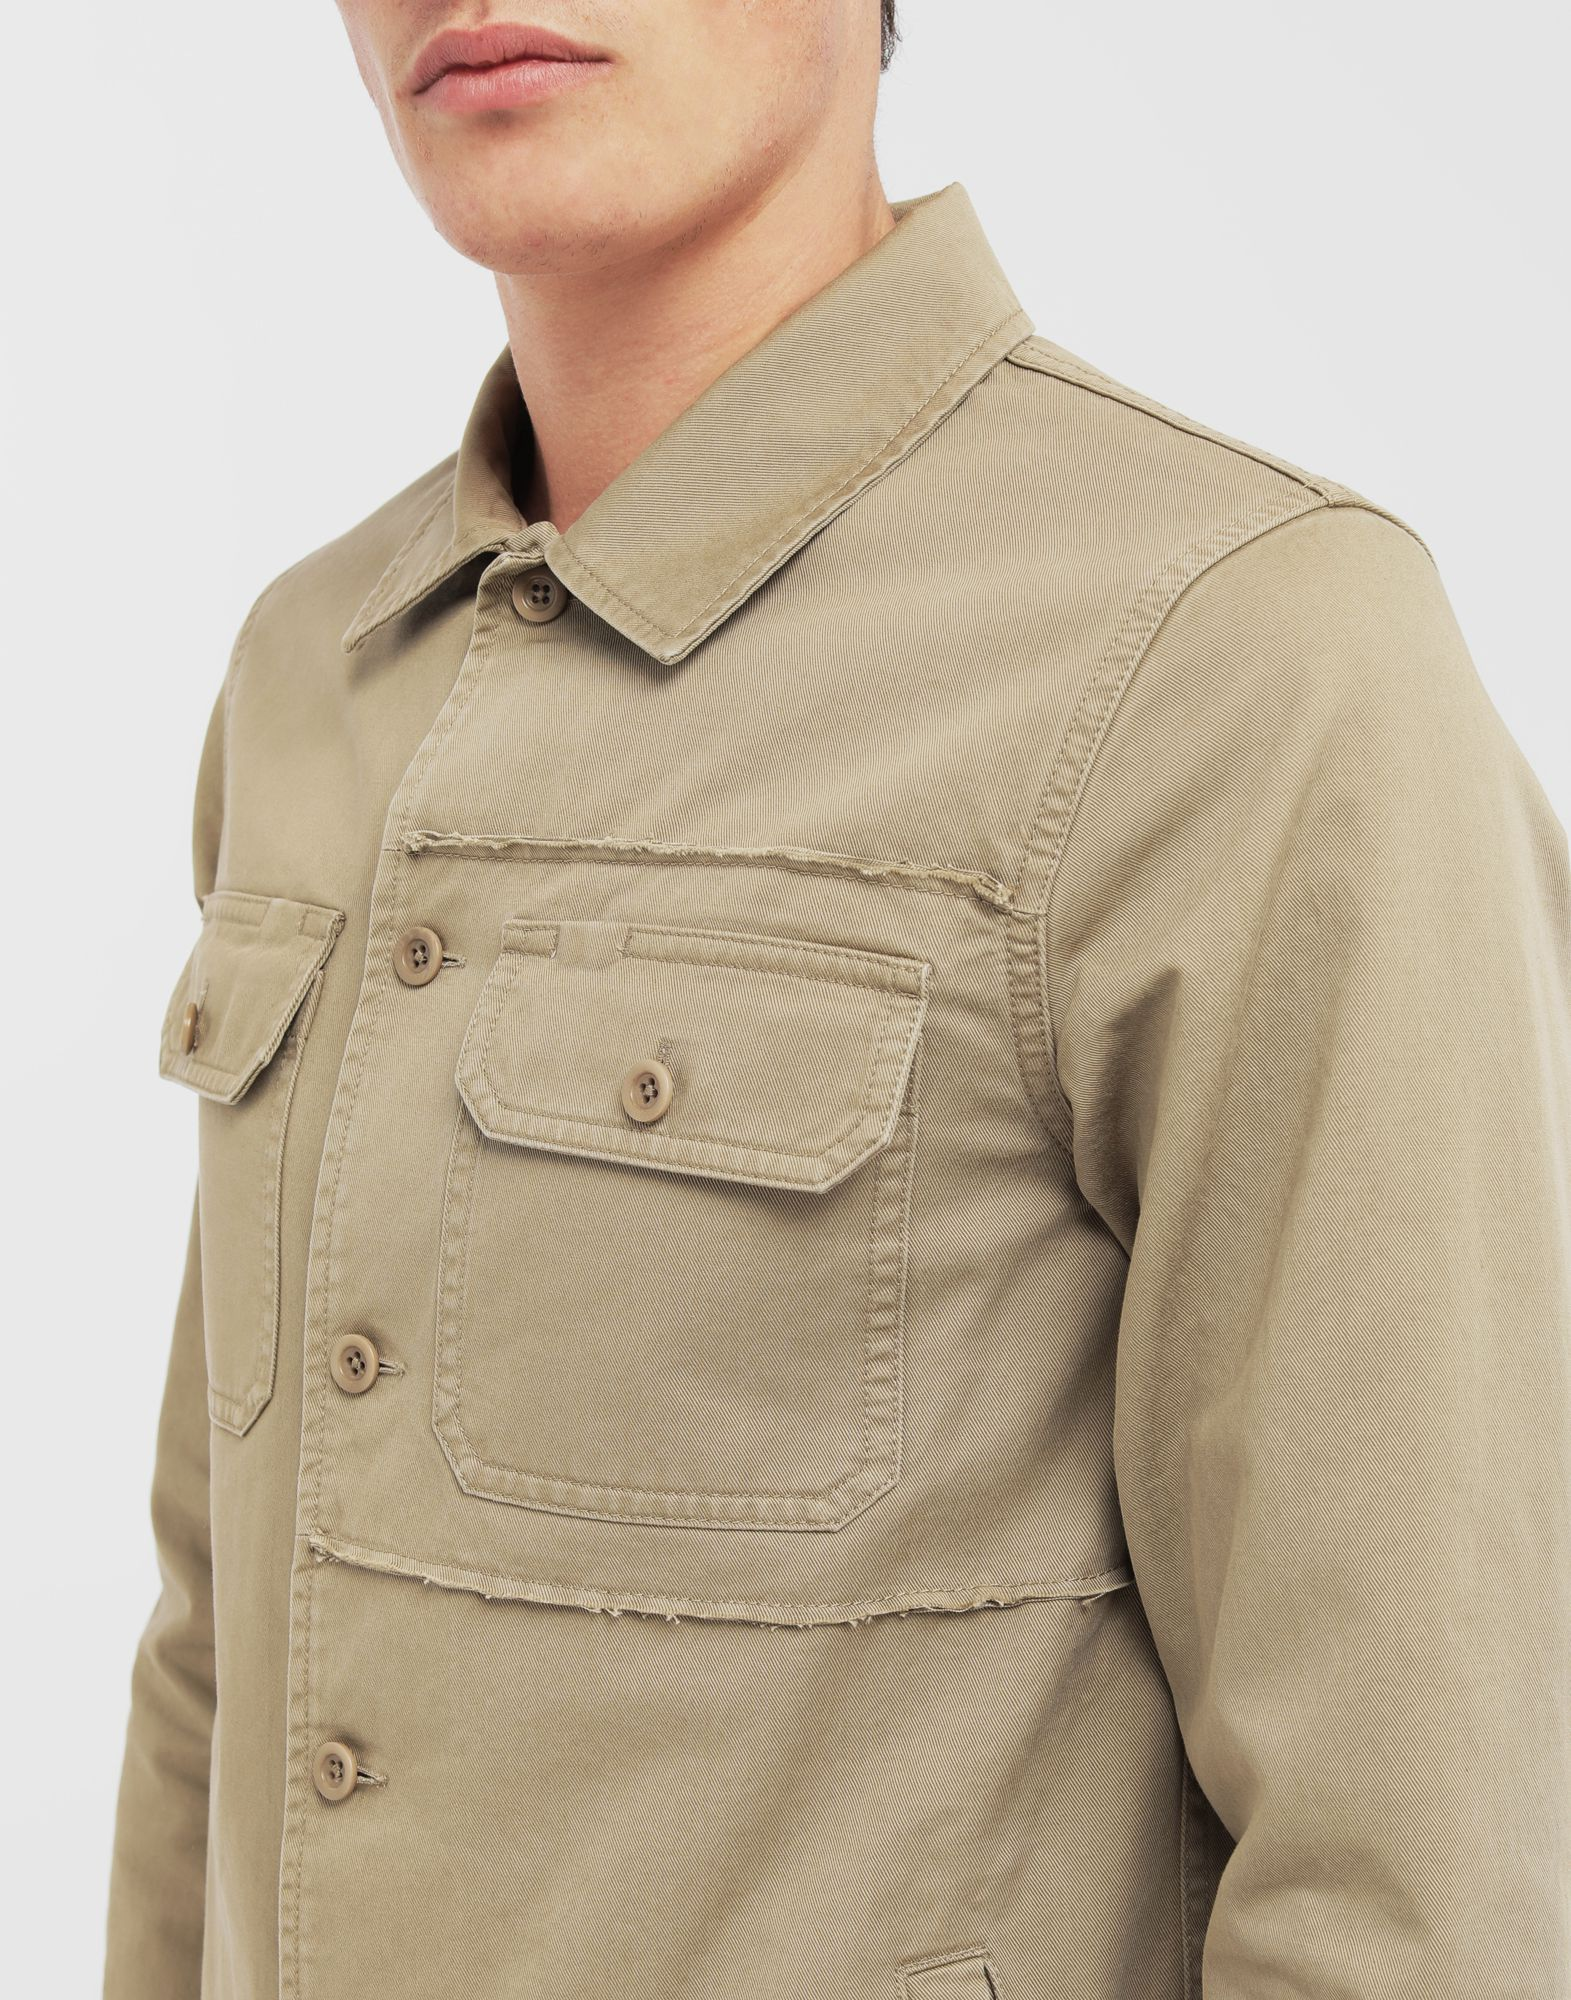 MAISON MARGIELA Shrunken military gabardine shirt Long sleeve shirt Man a